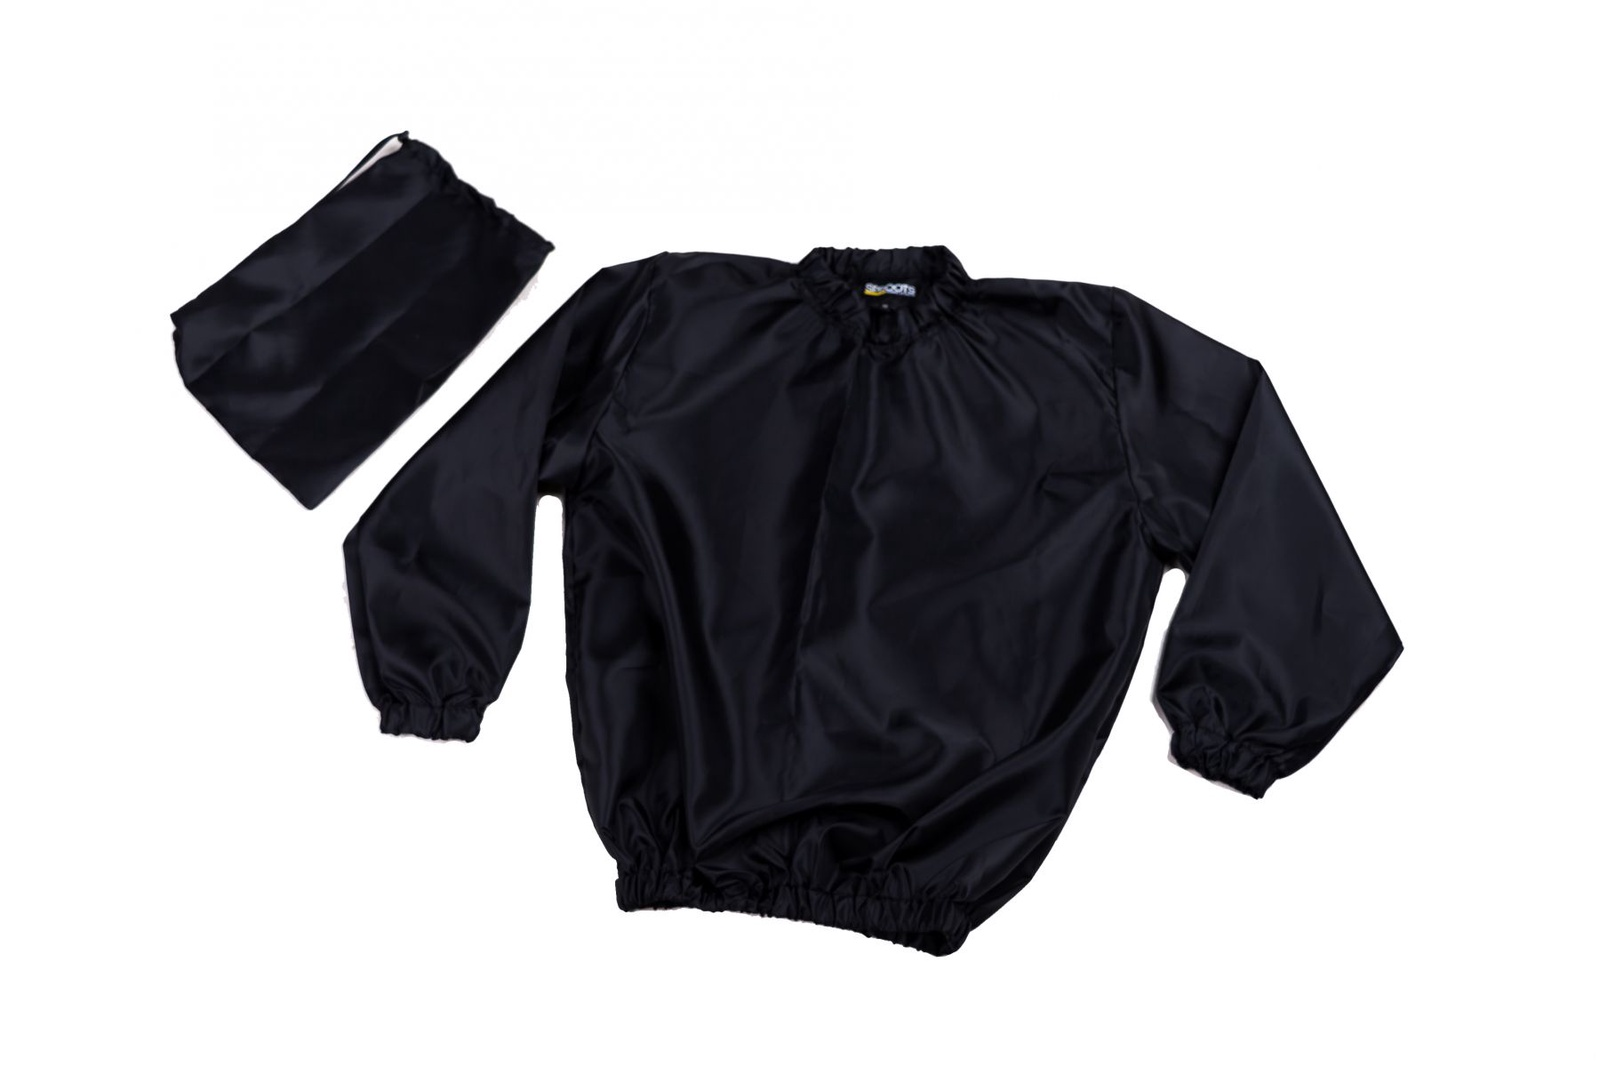 Костюм-сауна Sproots Куртка-Сауна PREMIUM, Размер L(48-52) бриджи сауна starfit sw 301 цвет серый размер l